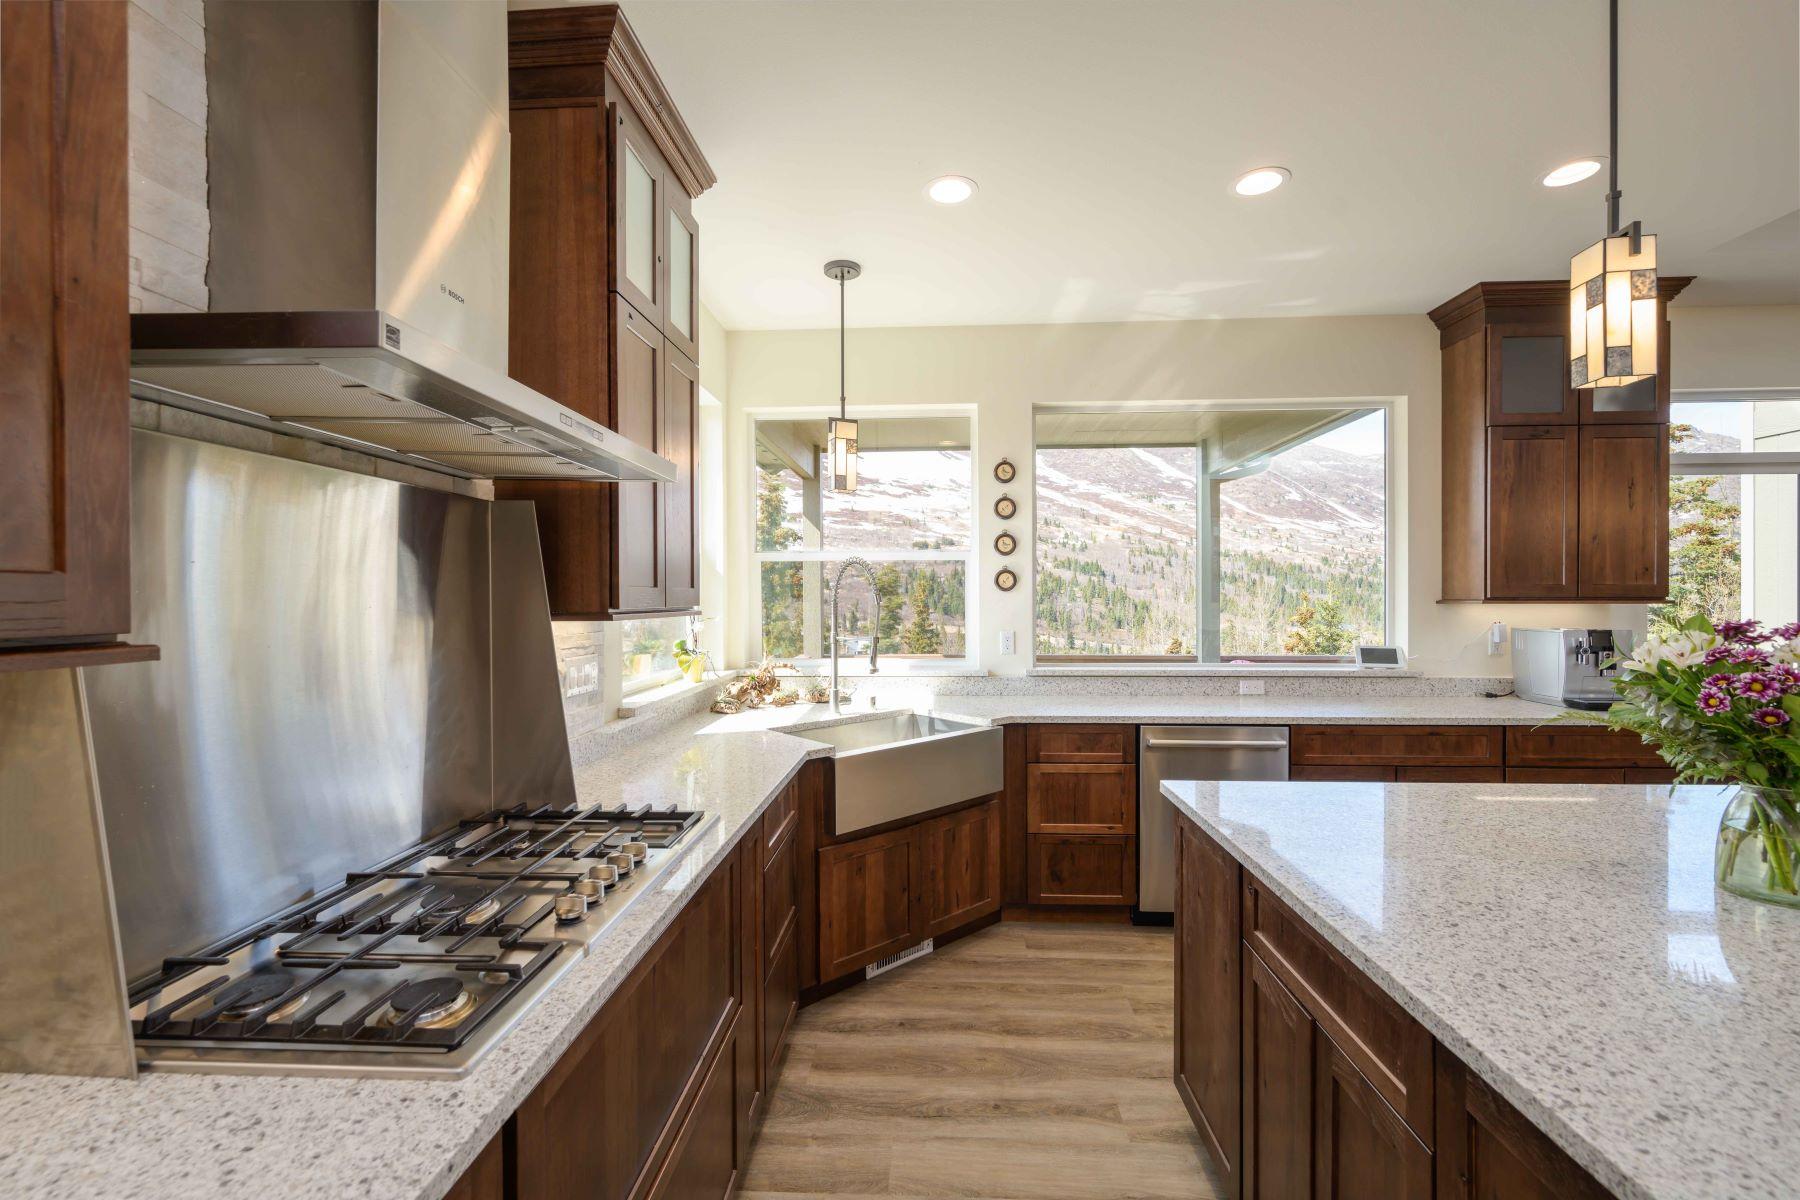 Additional photo for property listing at 2110 South River Drive, Eagle River, Alaska 99577 Estados Unidos